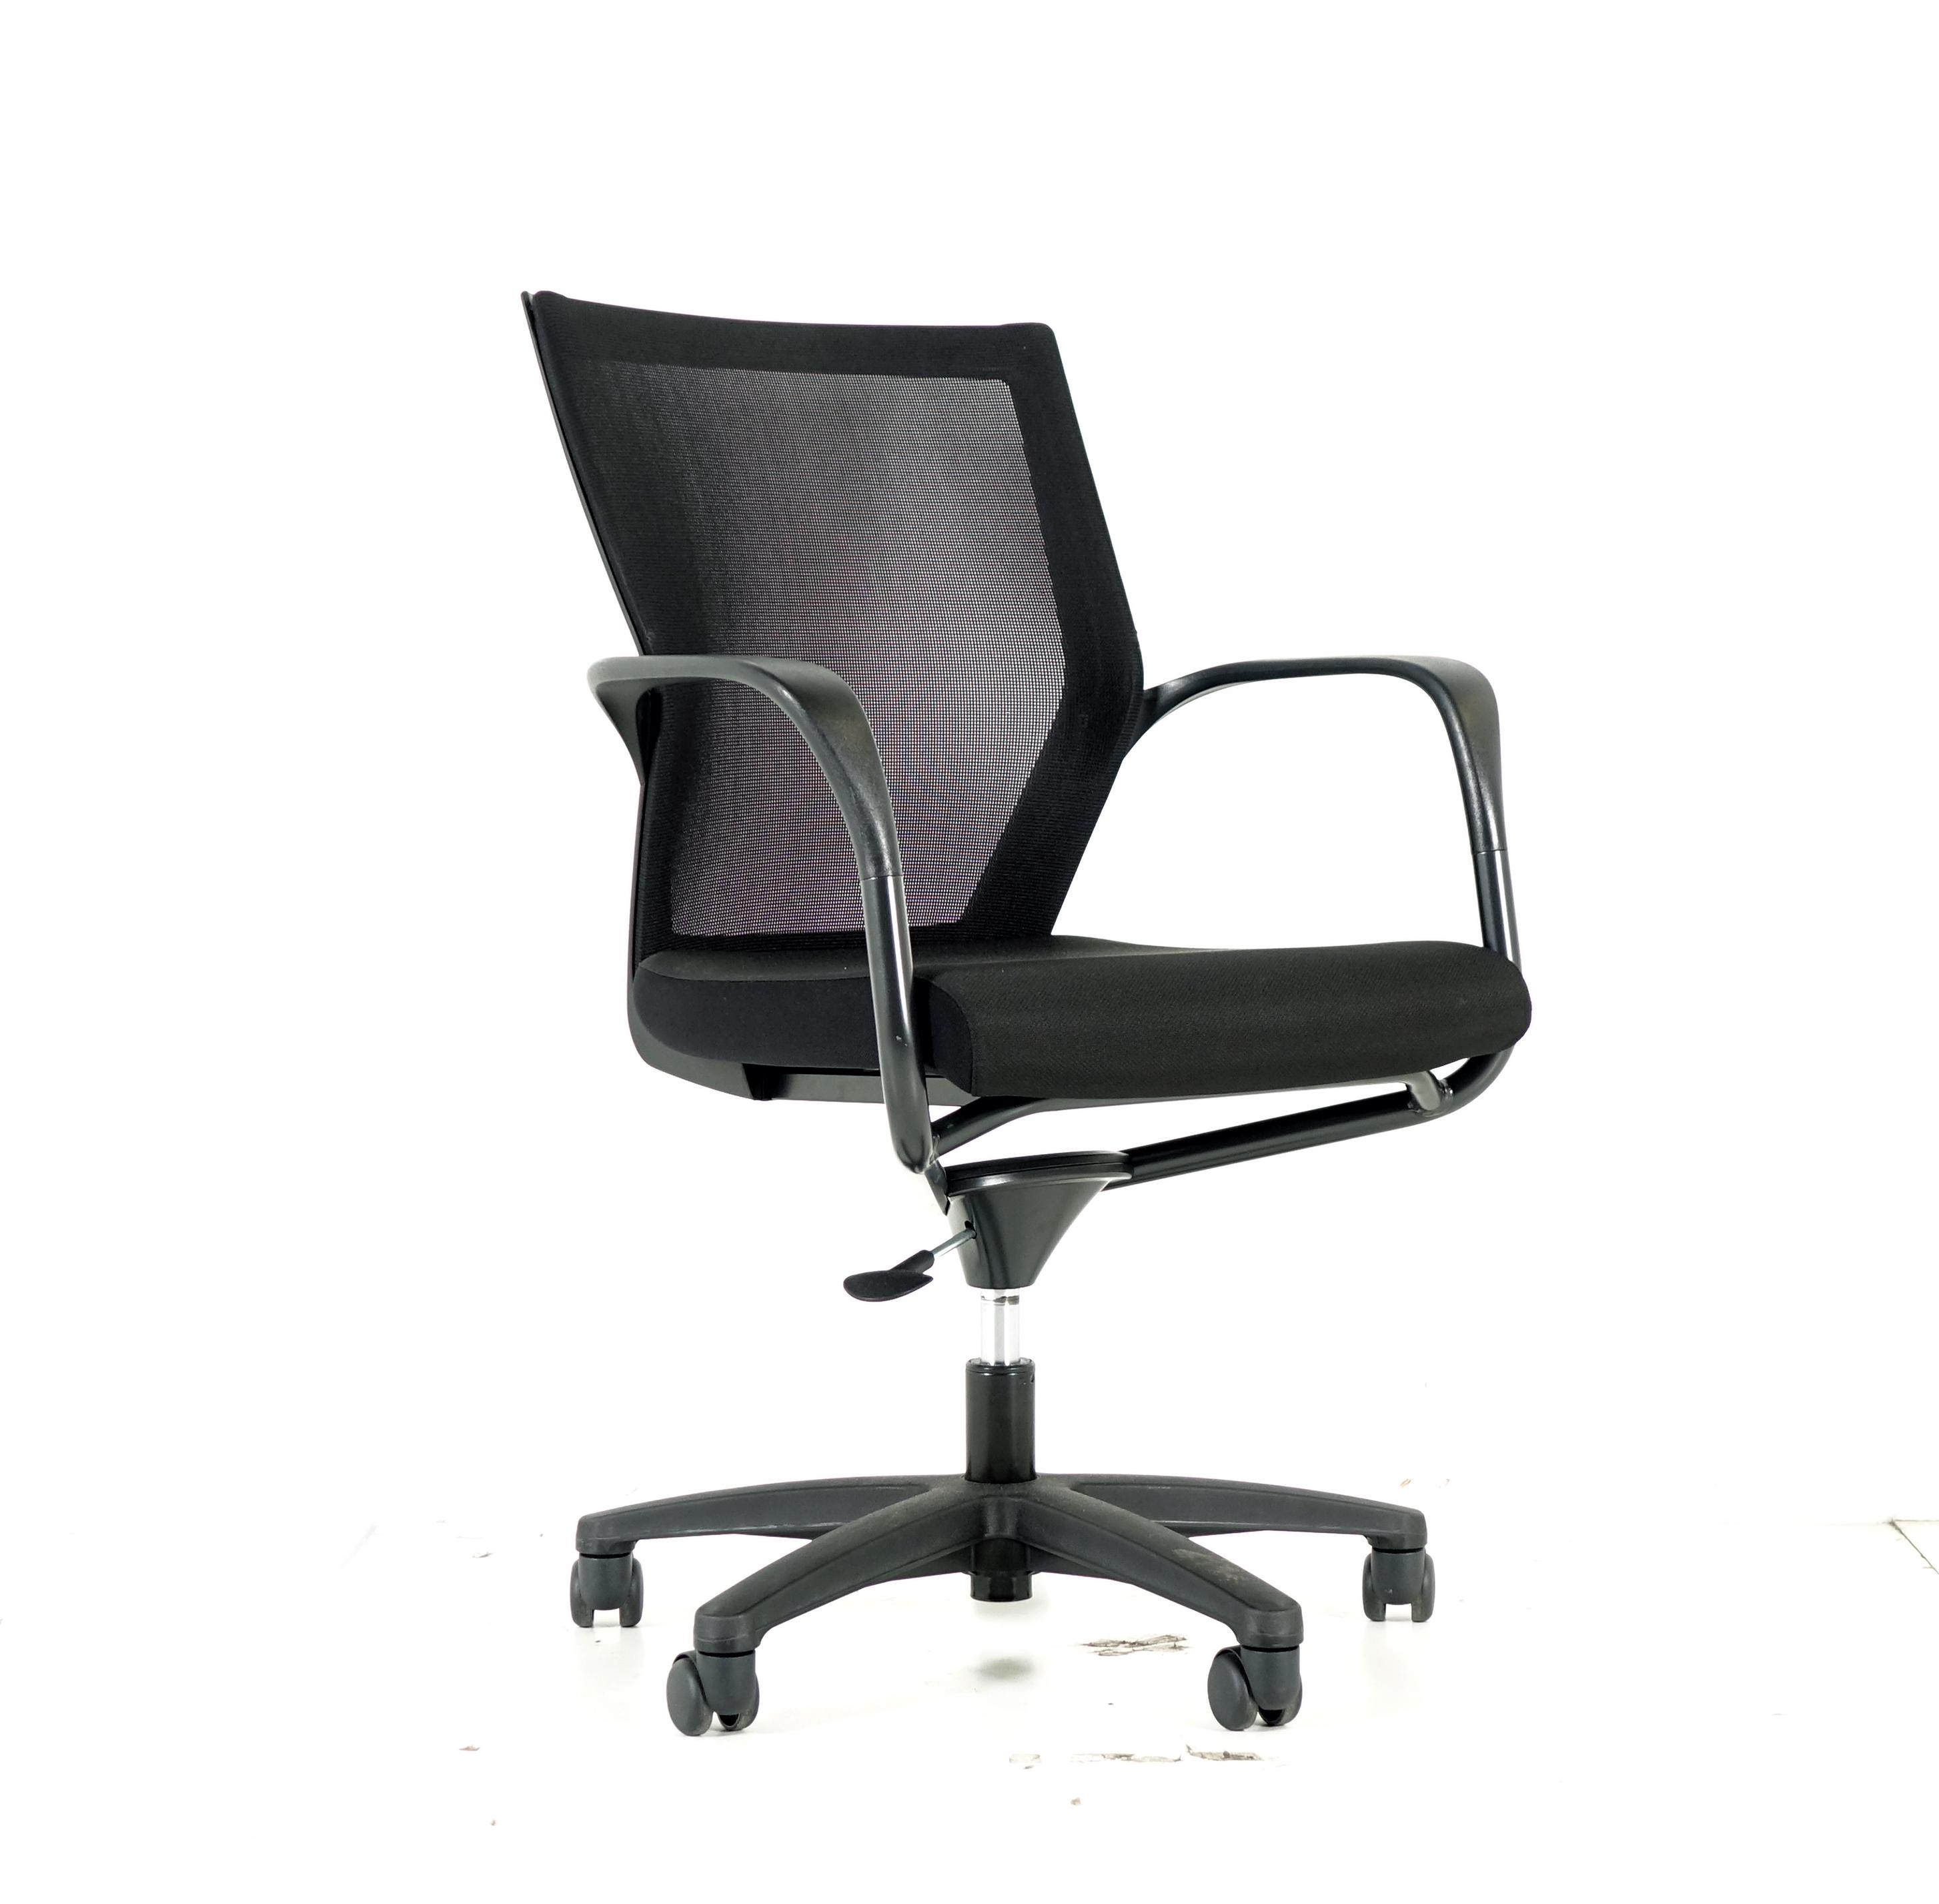 Sidiz T50C Meeting Room Chair